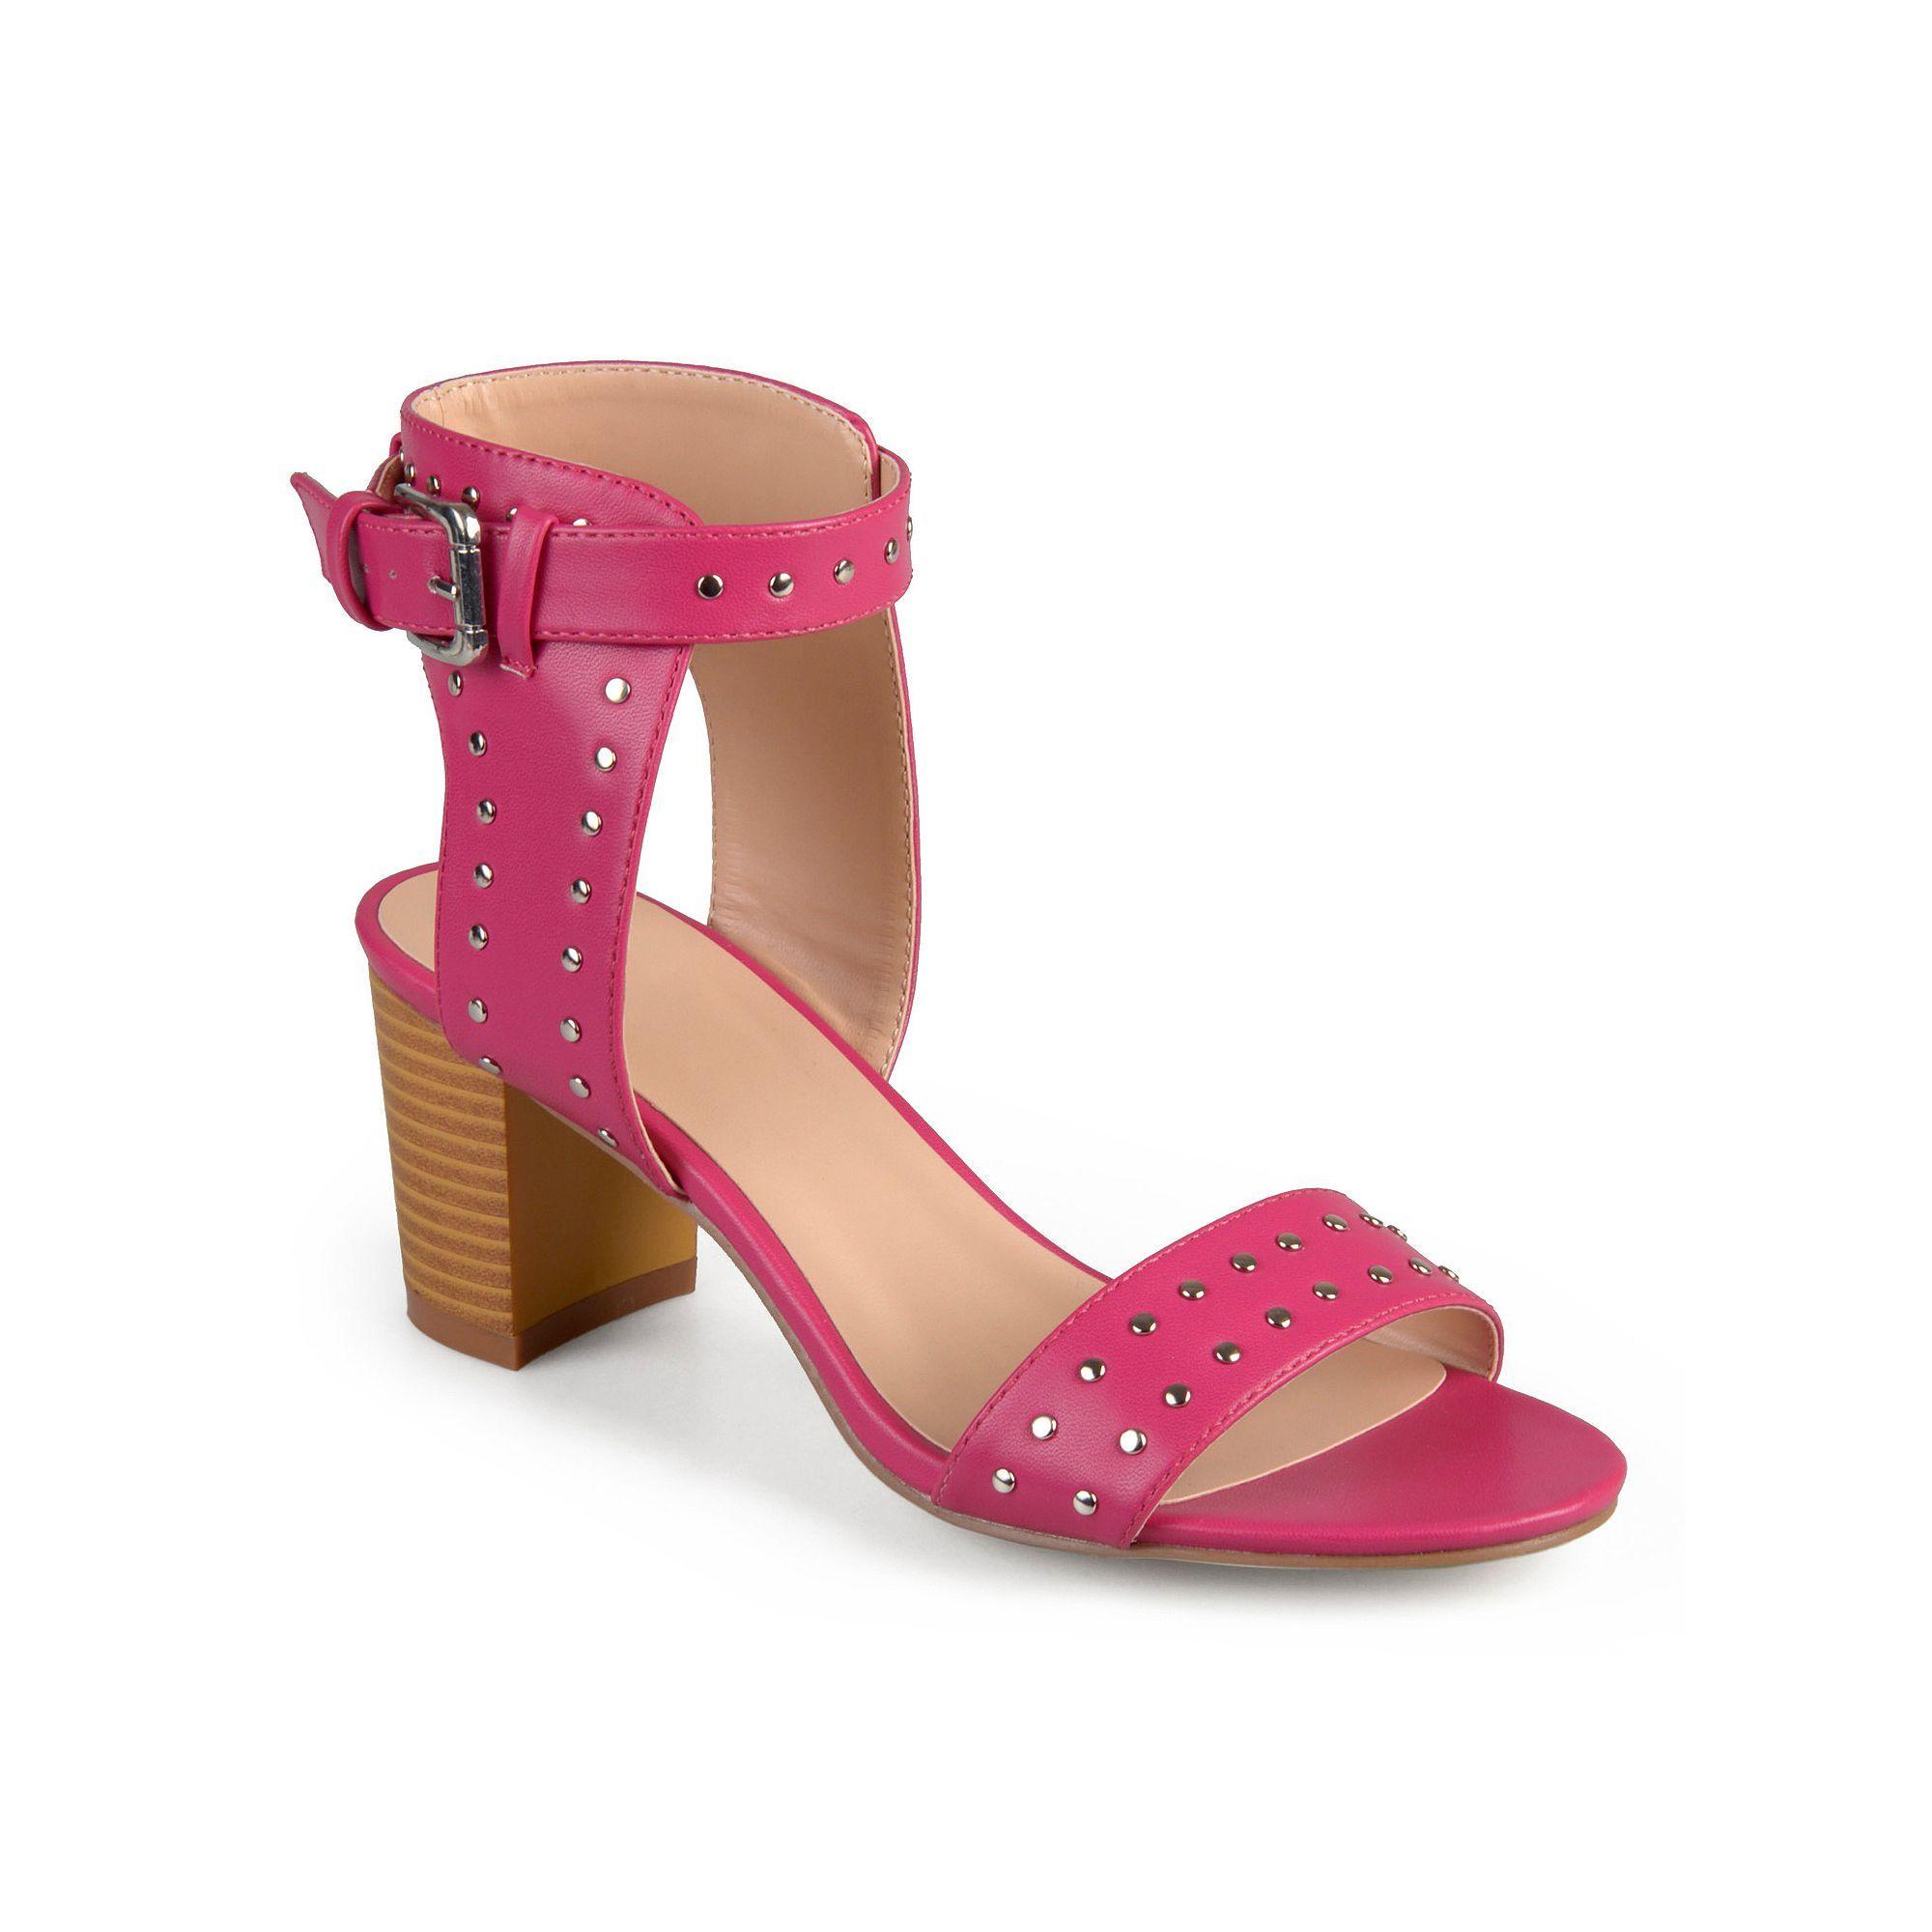 Womens sandals in size 12 - Journee Collection Mabel Women S Block Heel Sandals Size 12 Black